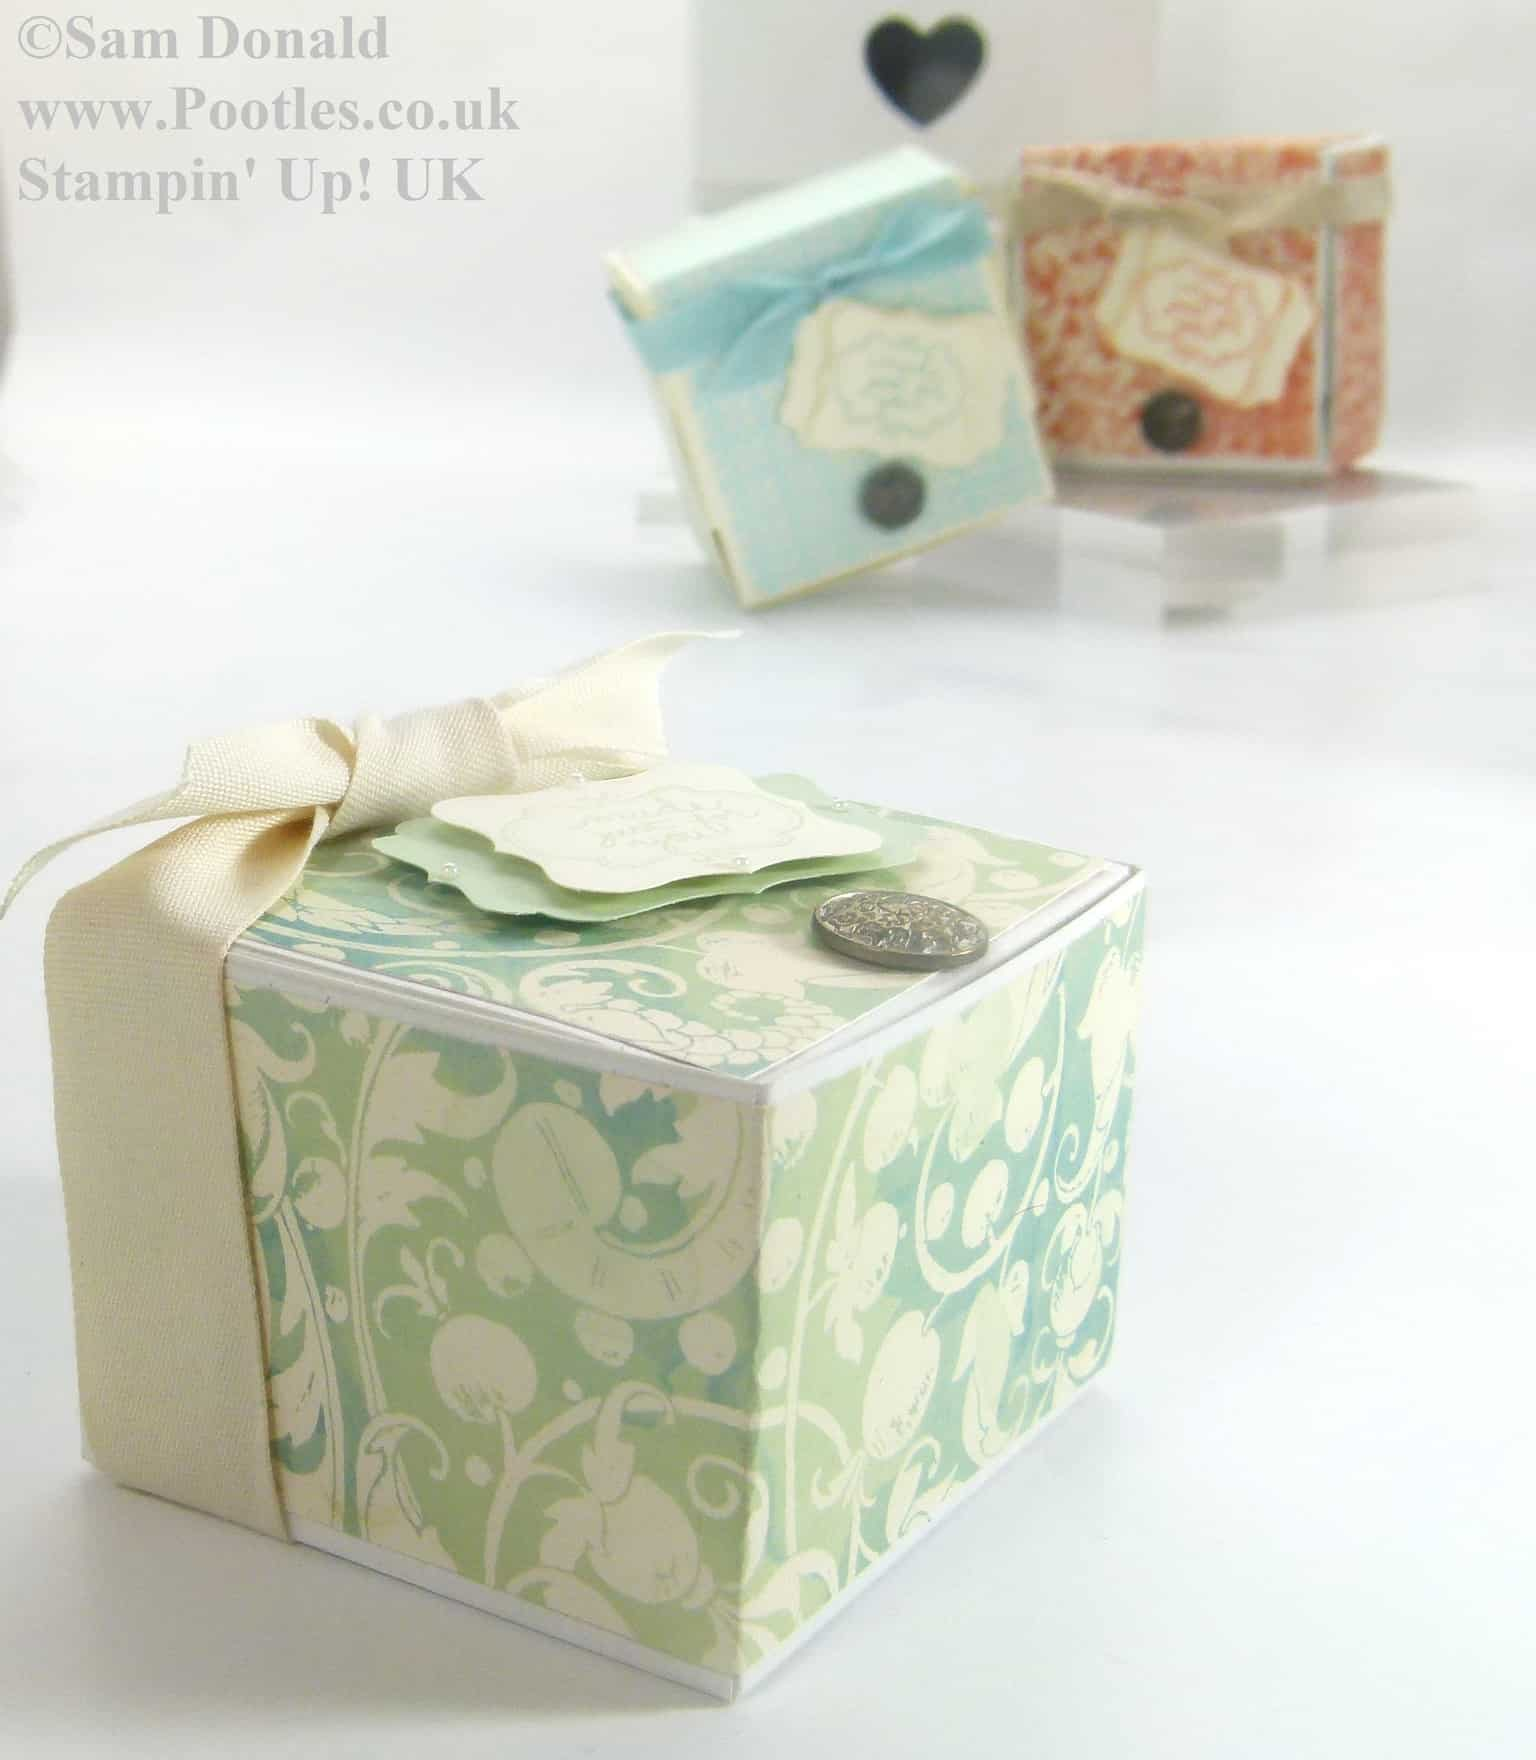 POOTLES Stampin Up Hinged Gift Box Tutorial 5